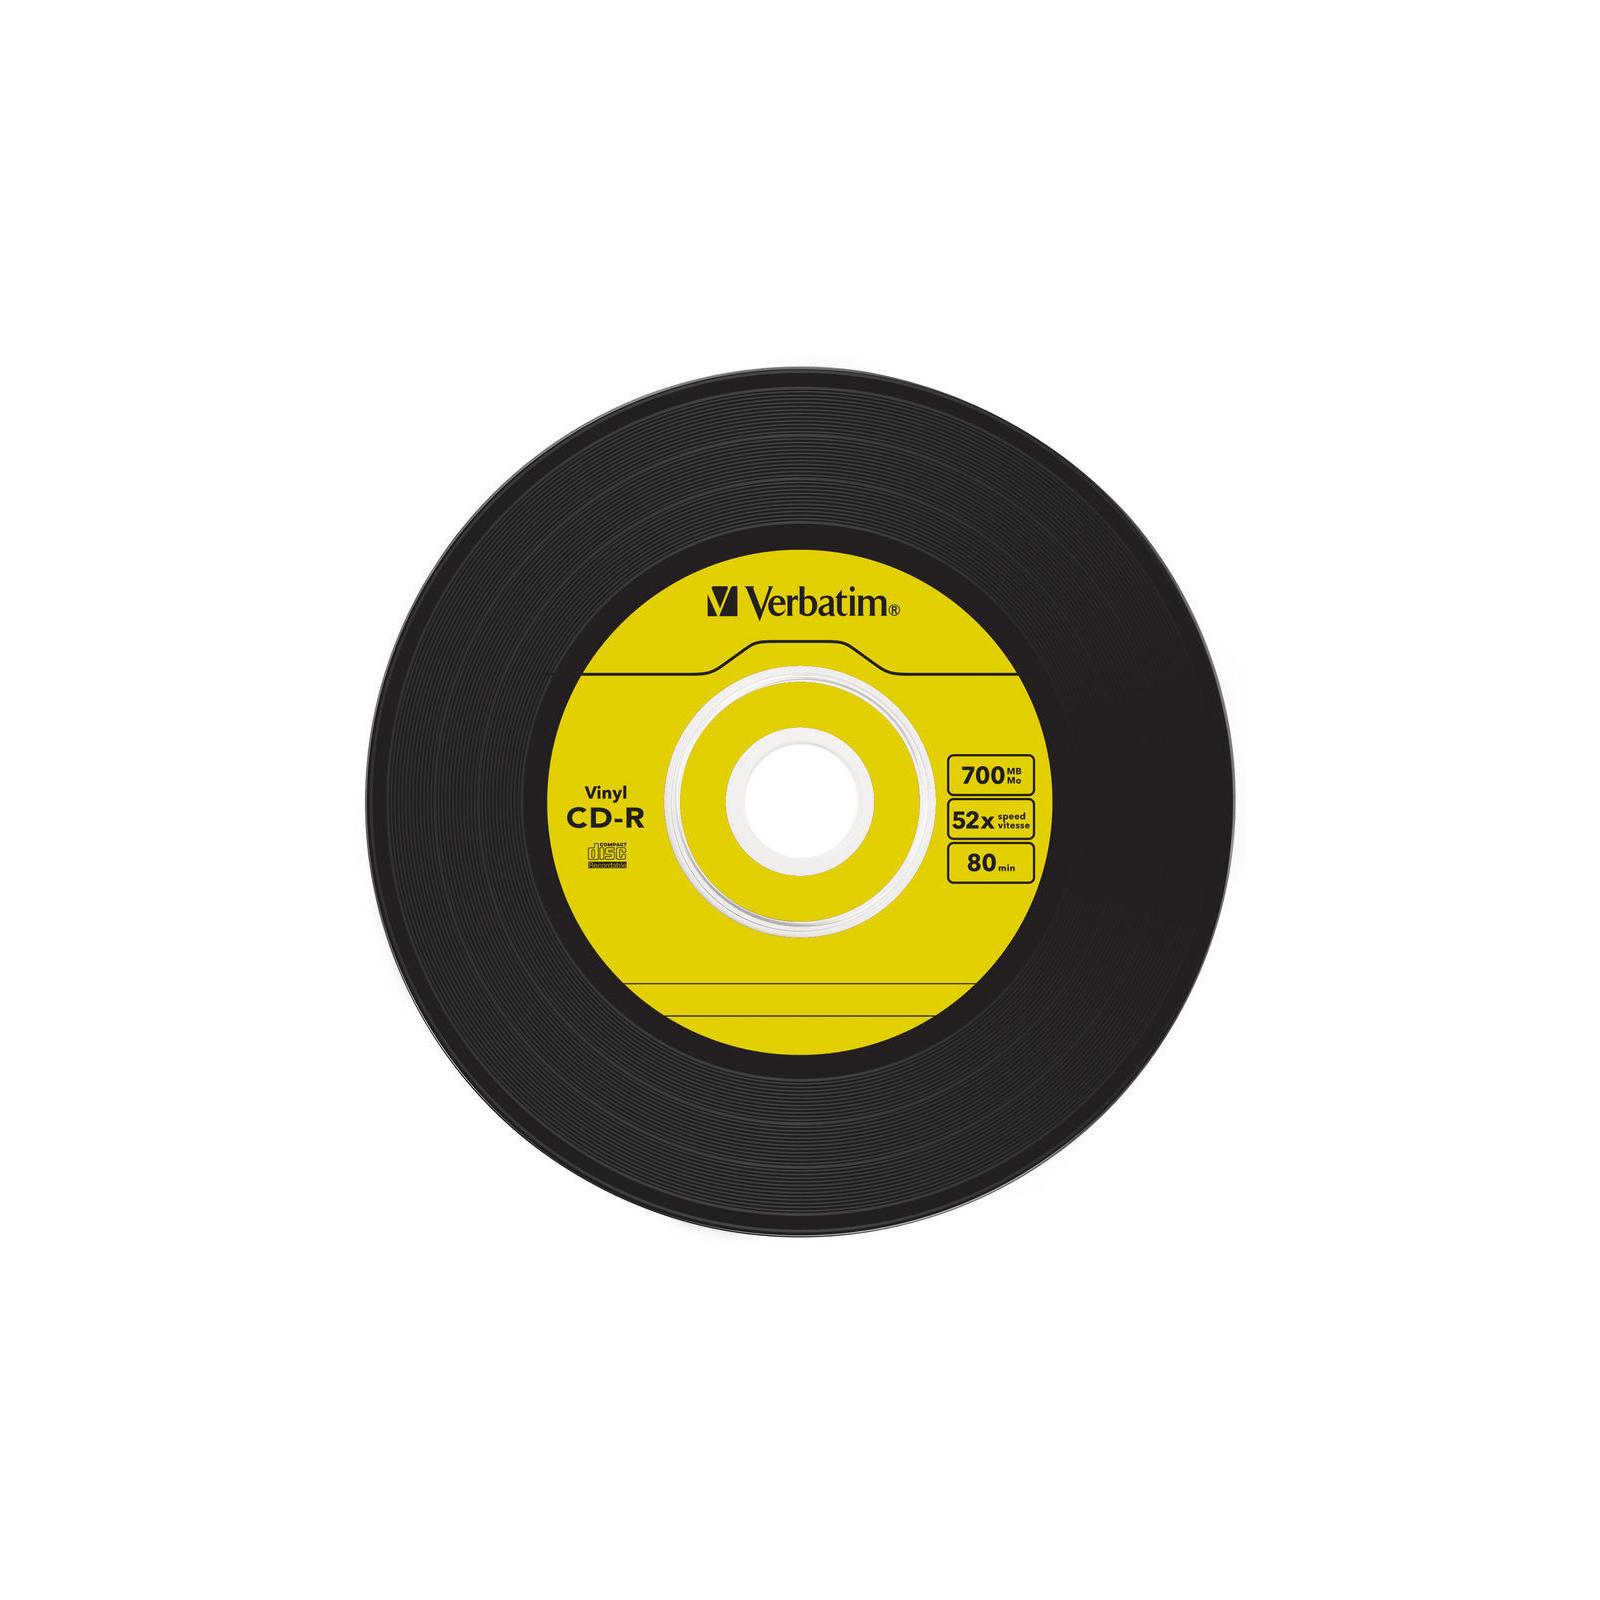 Диск CD Verbatim 700Mb 52x Slim case Vinyl AZO (43426) изображение 3